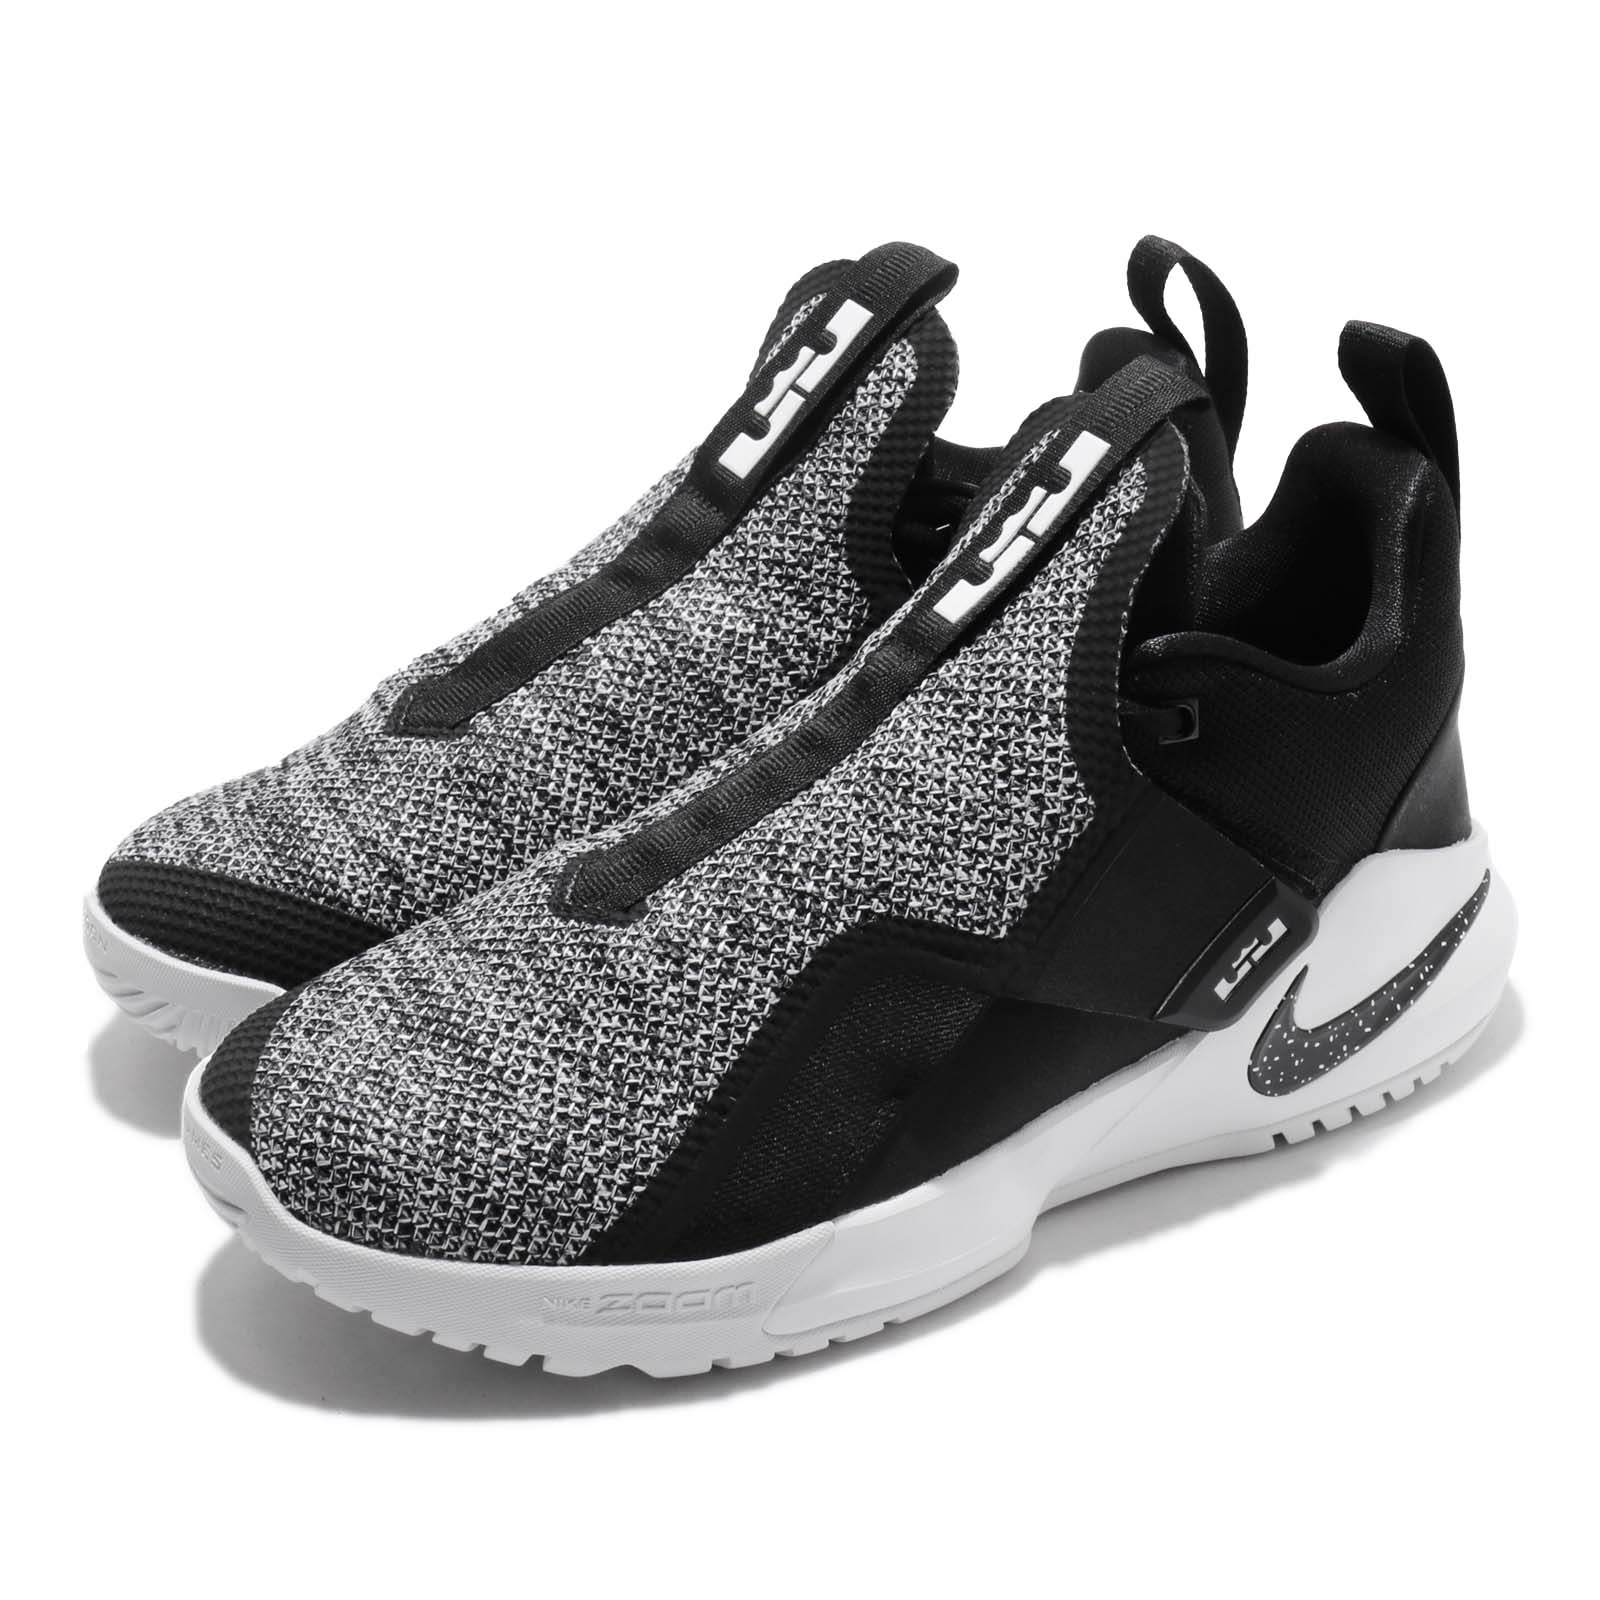 Nike 籃球鞋 Ambassador XI 男鞋 AO2920-003